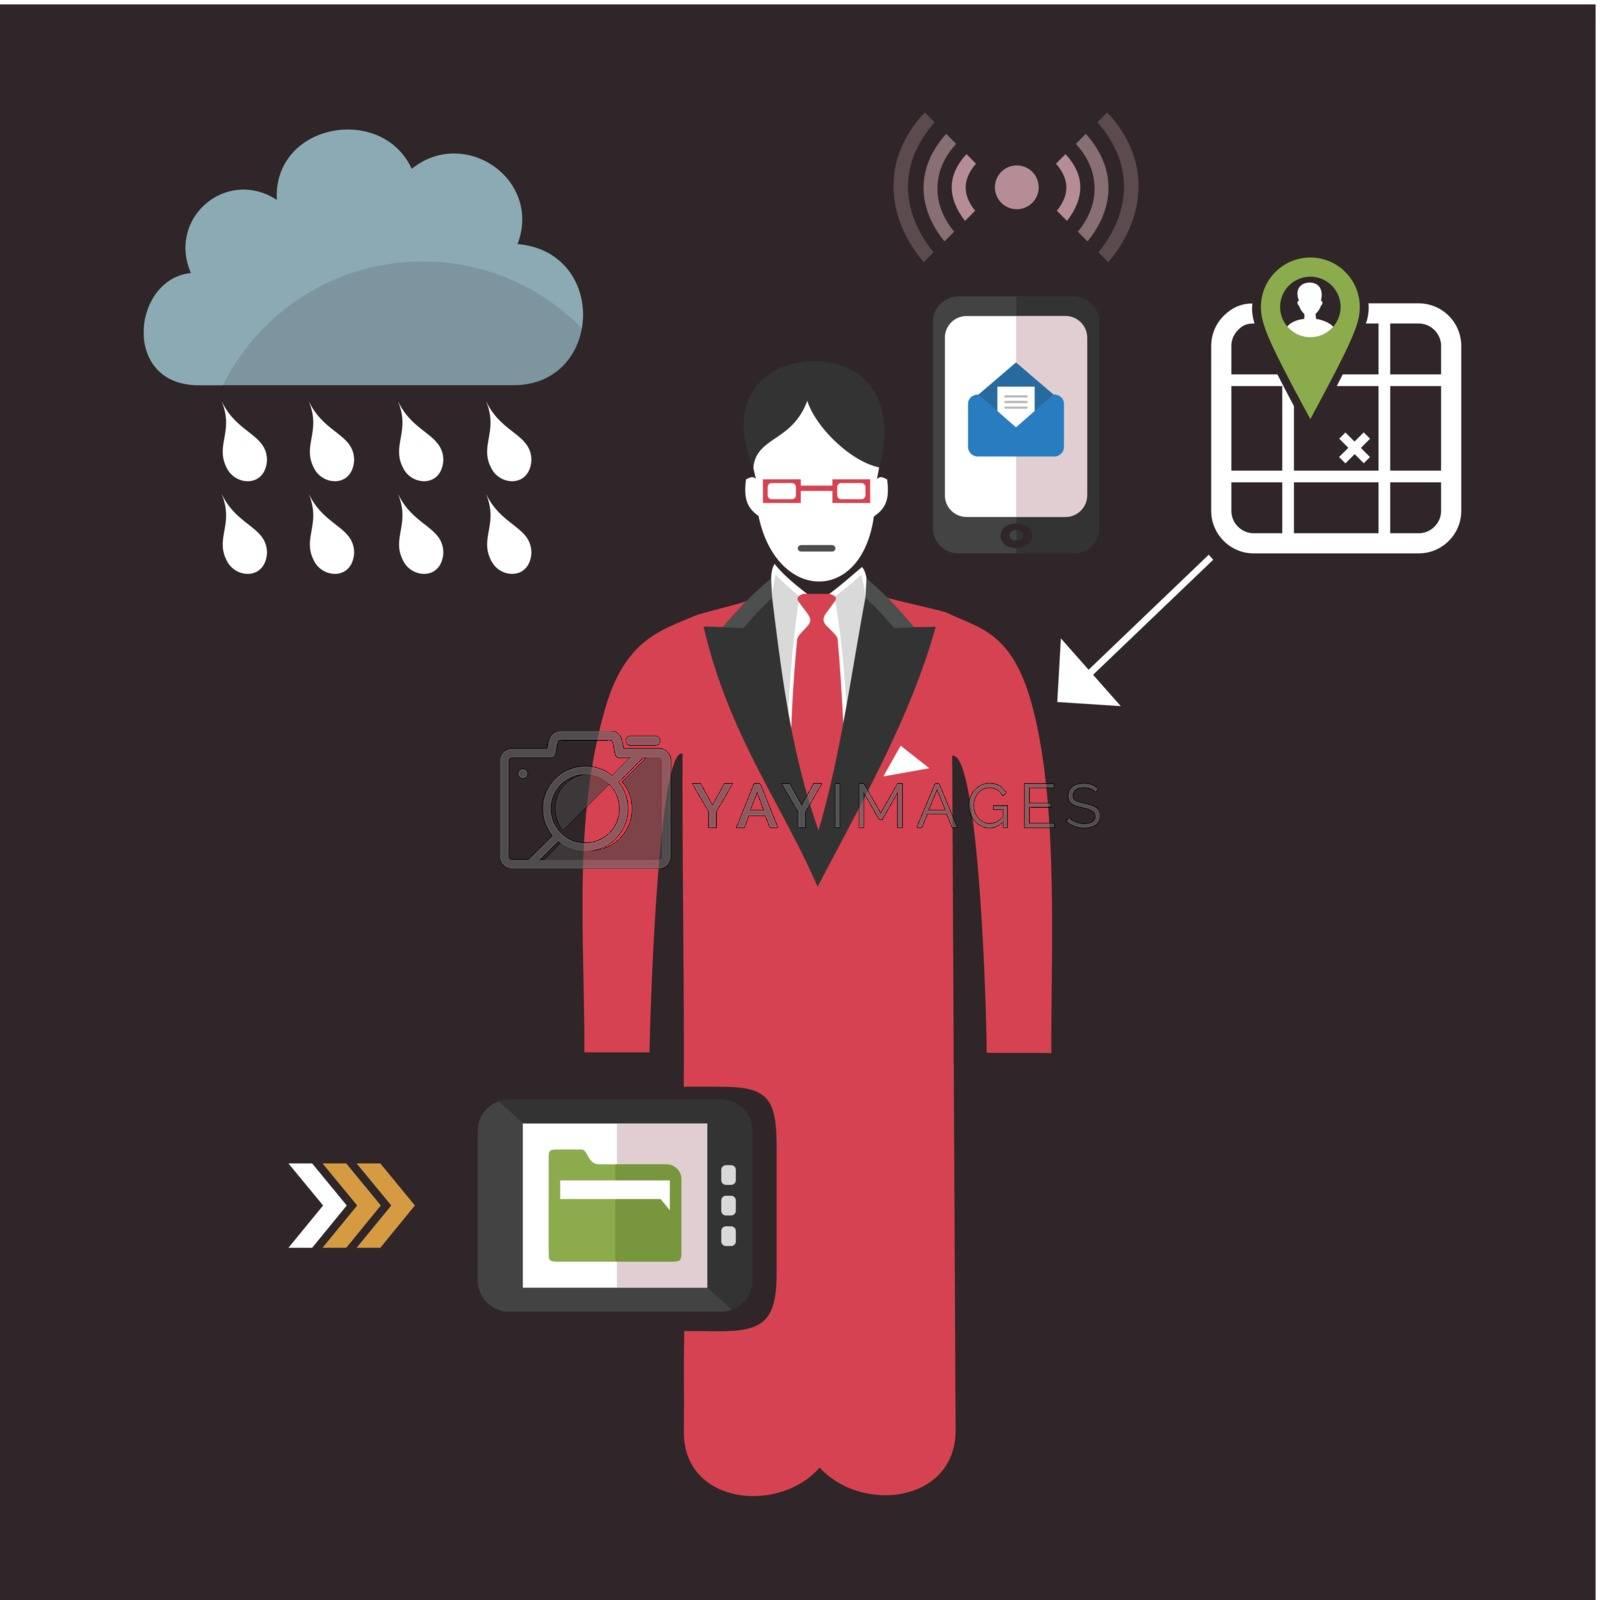 Online business commerce. A vector illustration